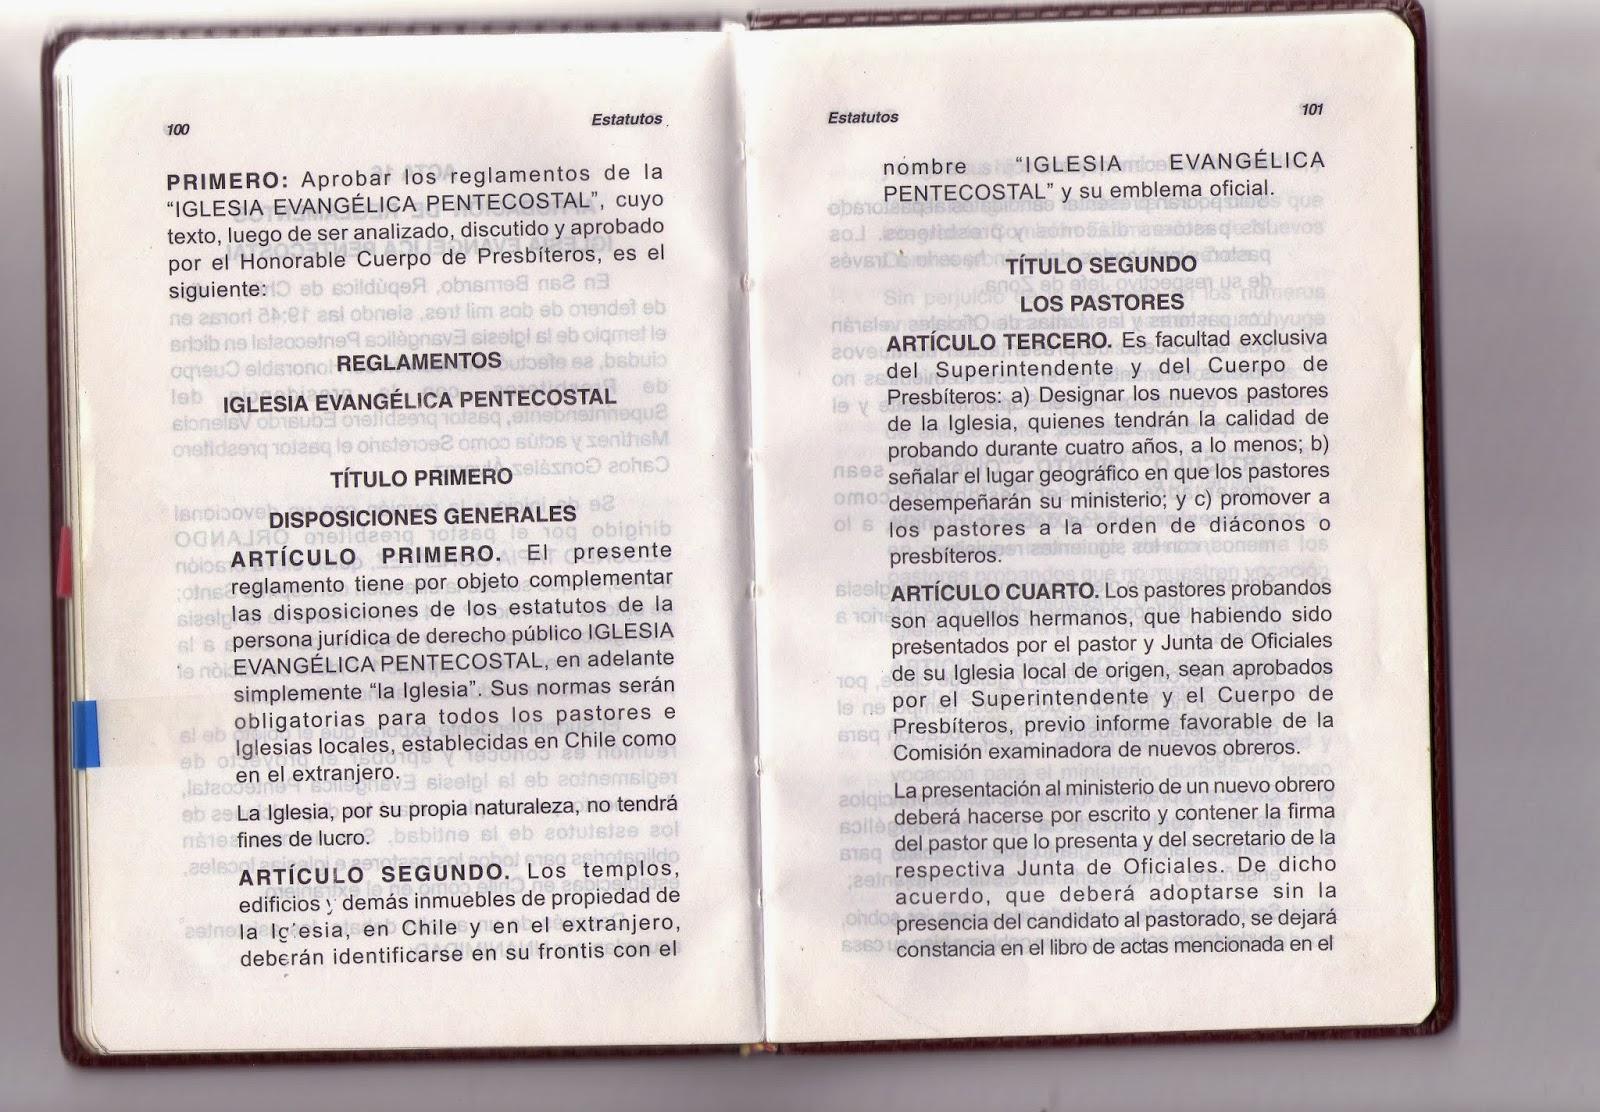 Corrupcion Iglesia Evangelica Pentecostal Iglesia Evangelica Pentecostal